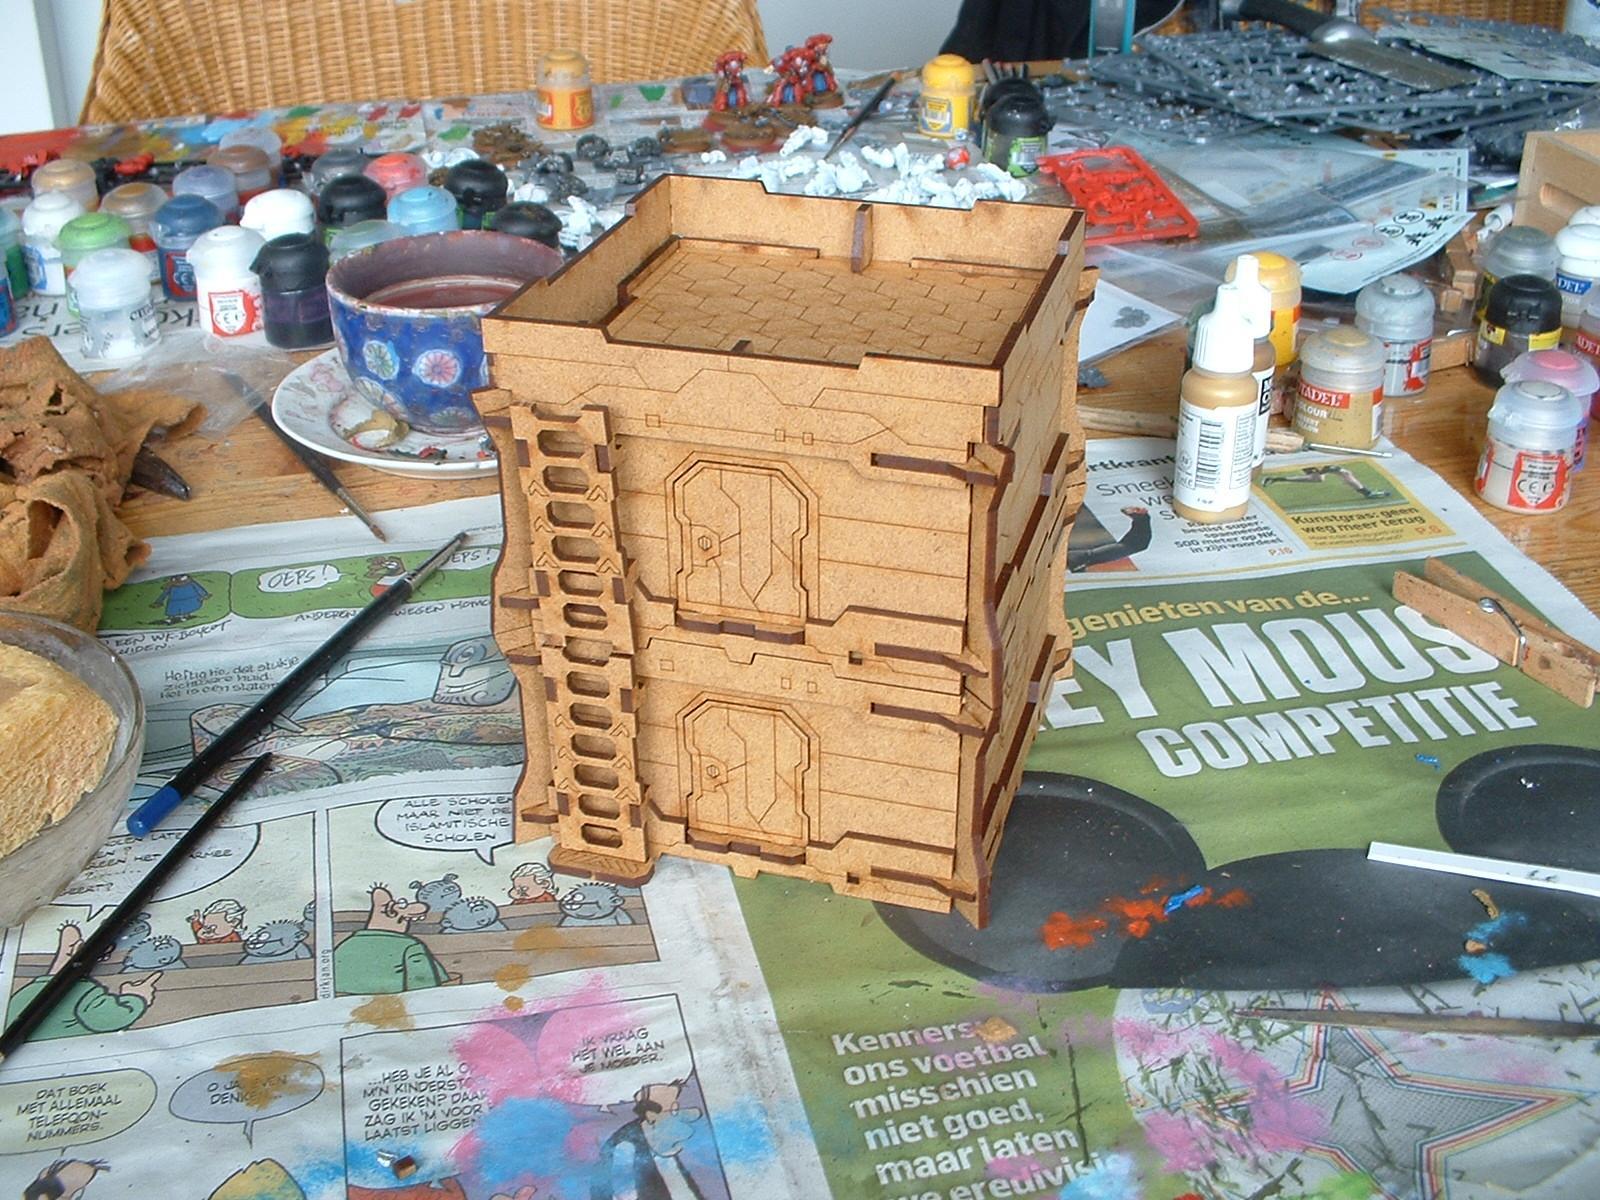 Bunker, Mdf, Micro Art Studios, Terrain, Work In Progress